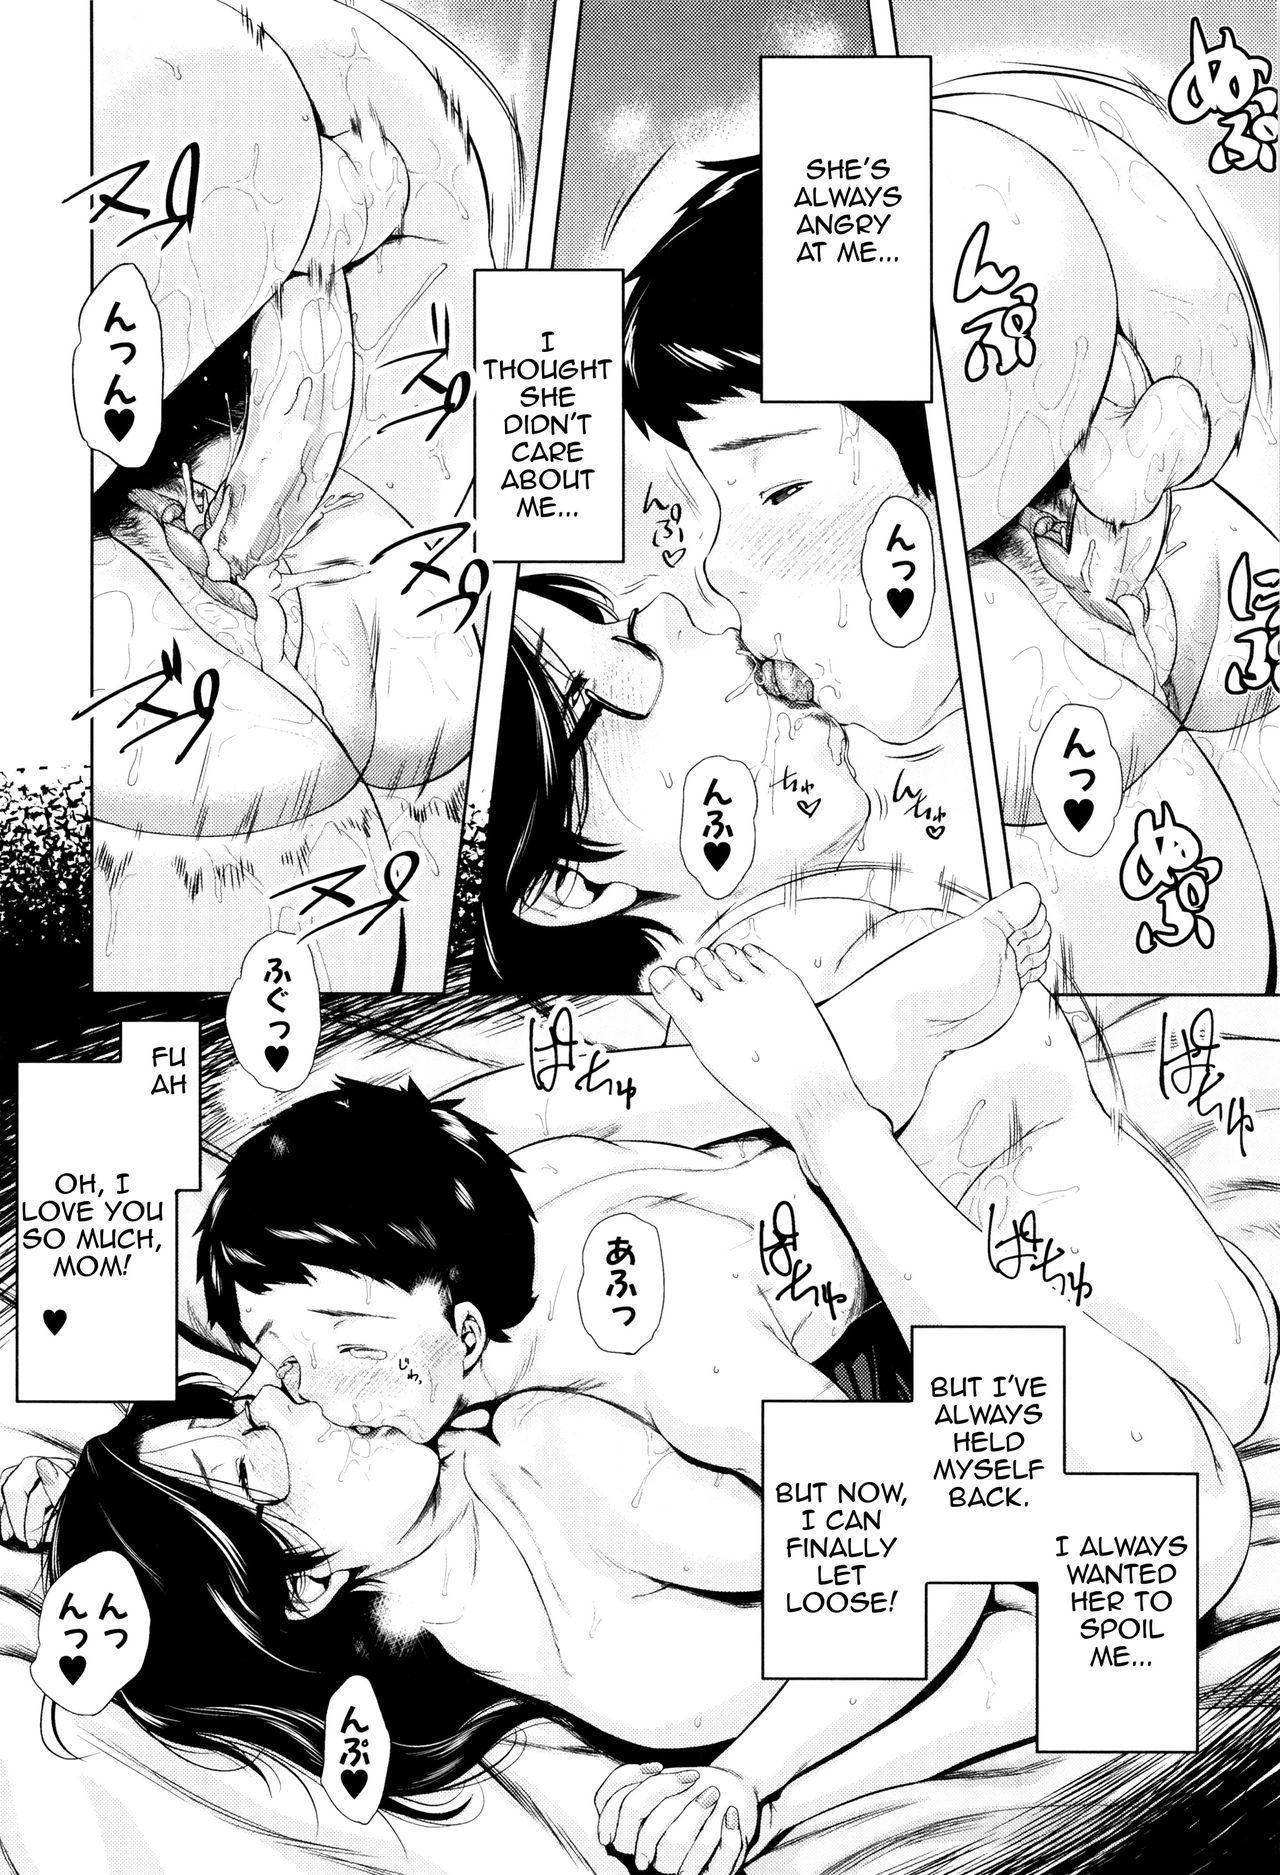 [Jitsuma] Kinyoubi no Haha-tachi e - To Friday's mothers [English] [Amoskandy, desudesu, Kusanyagi] 134